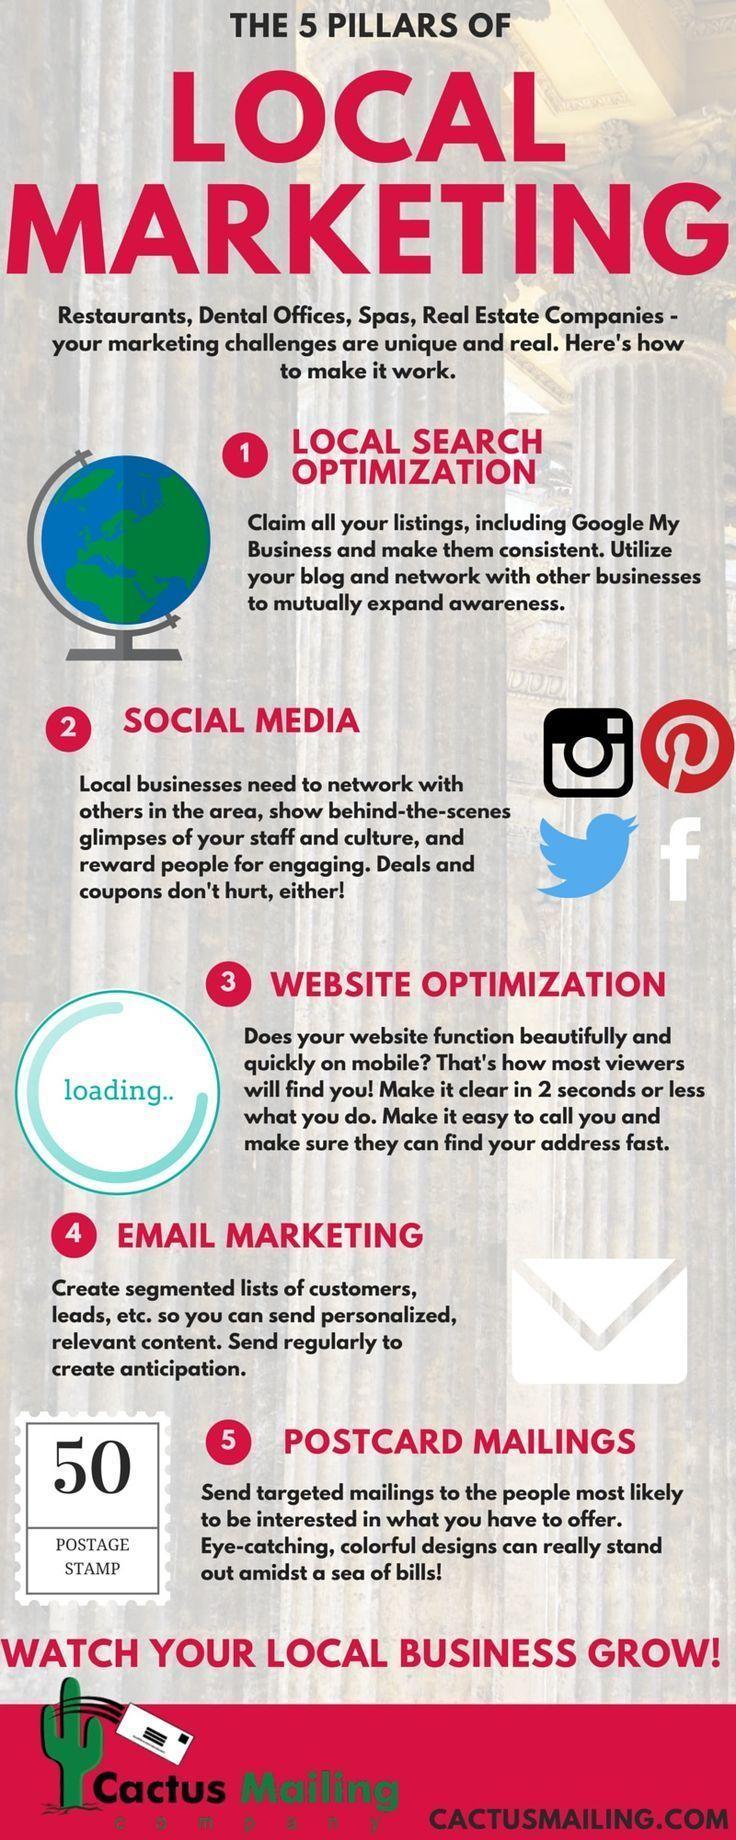 5 Pillars of Local Marketing Help Your Dental practice